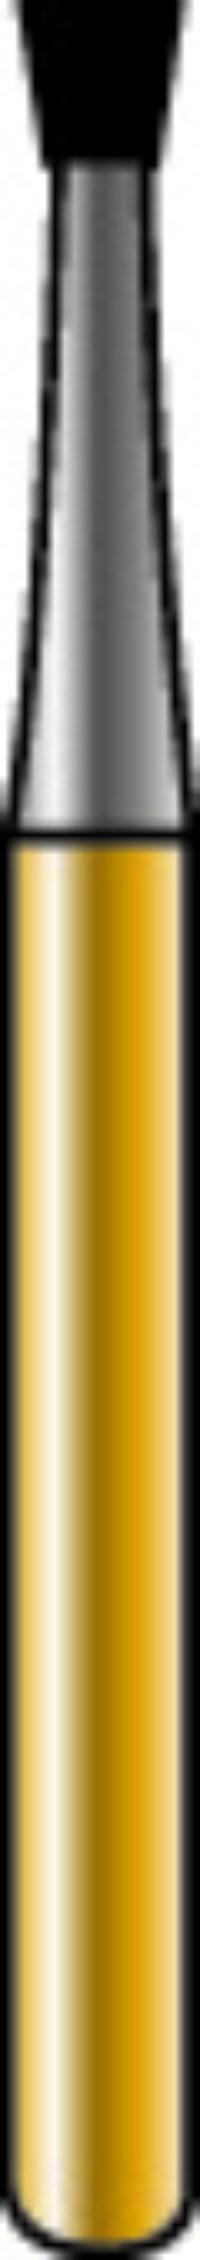 CLOSEOUT SALE: Inverted Cone Golden Sharpie